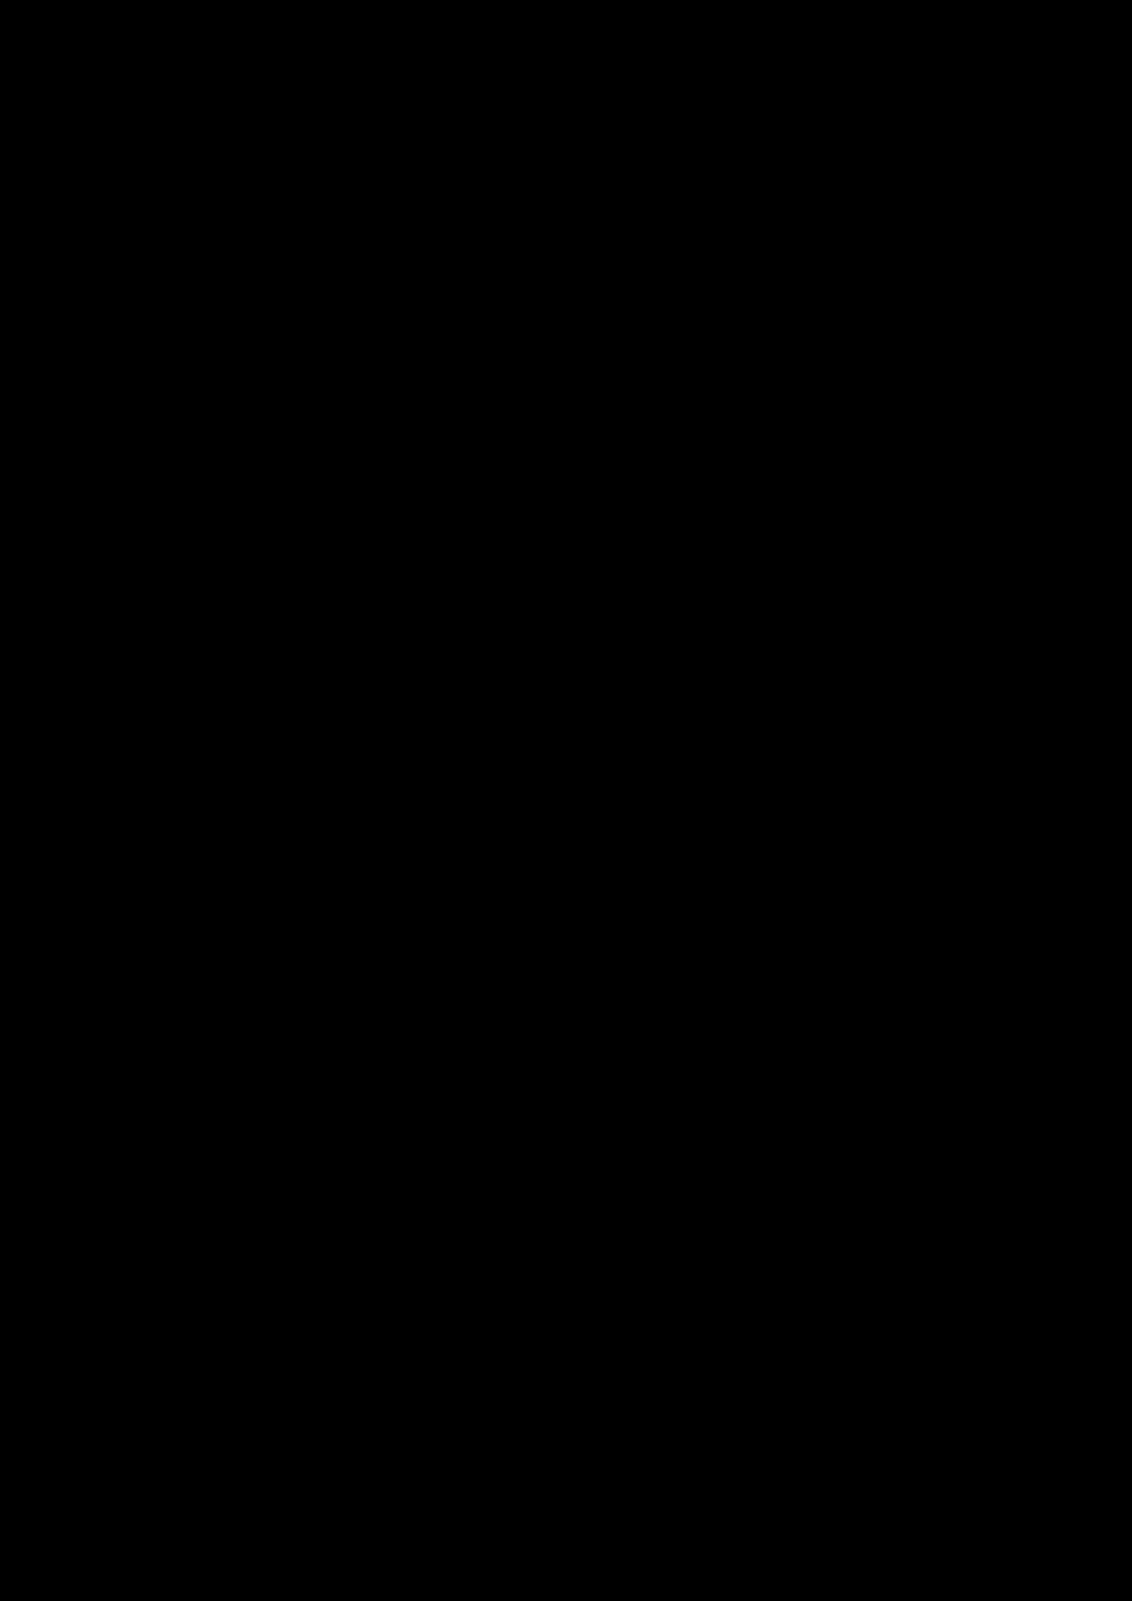 Ispoved Pervogo Boga slide, Image 4